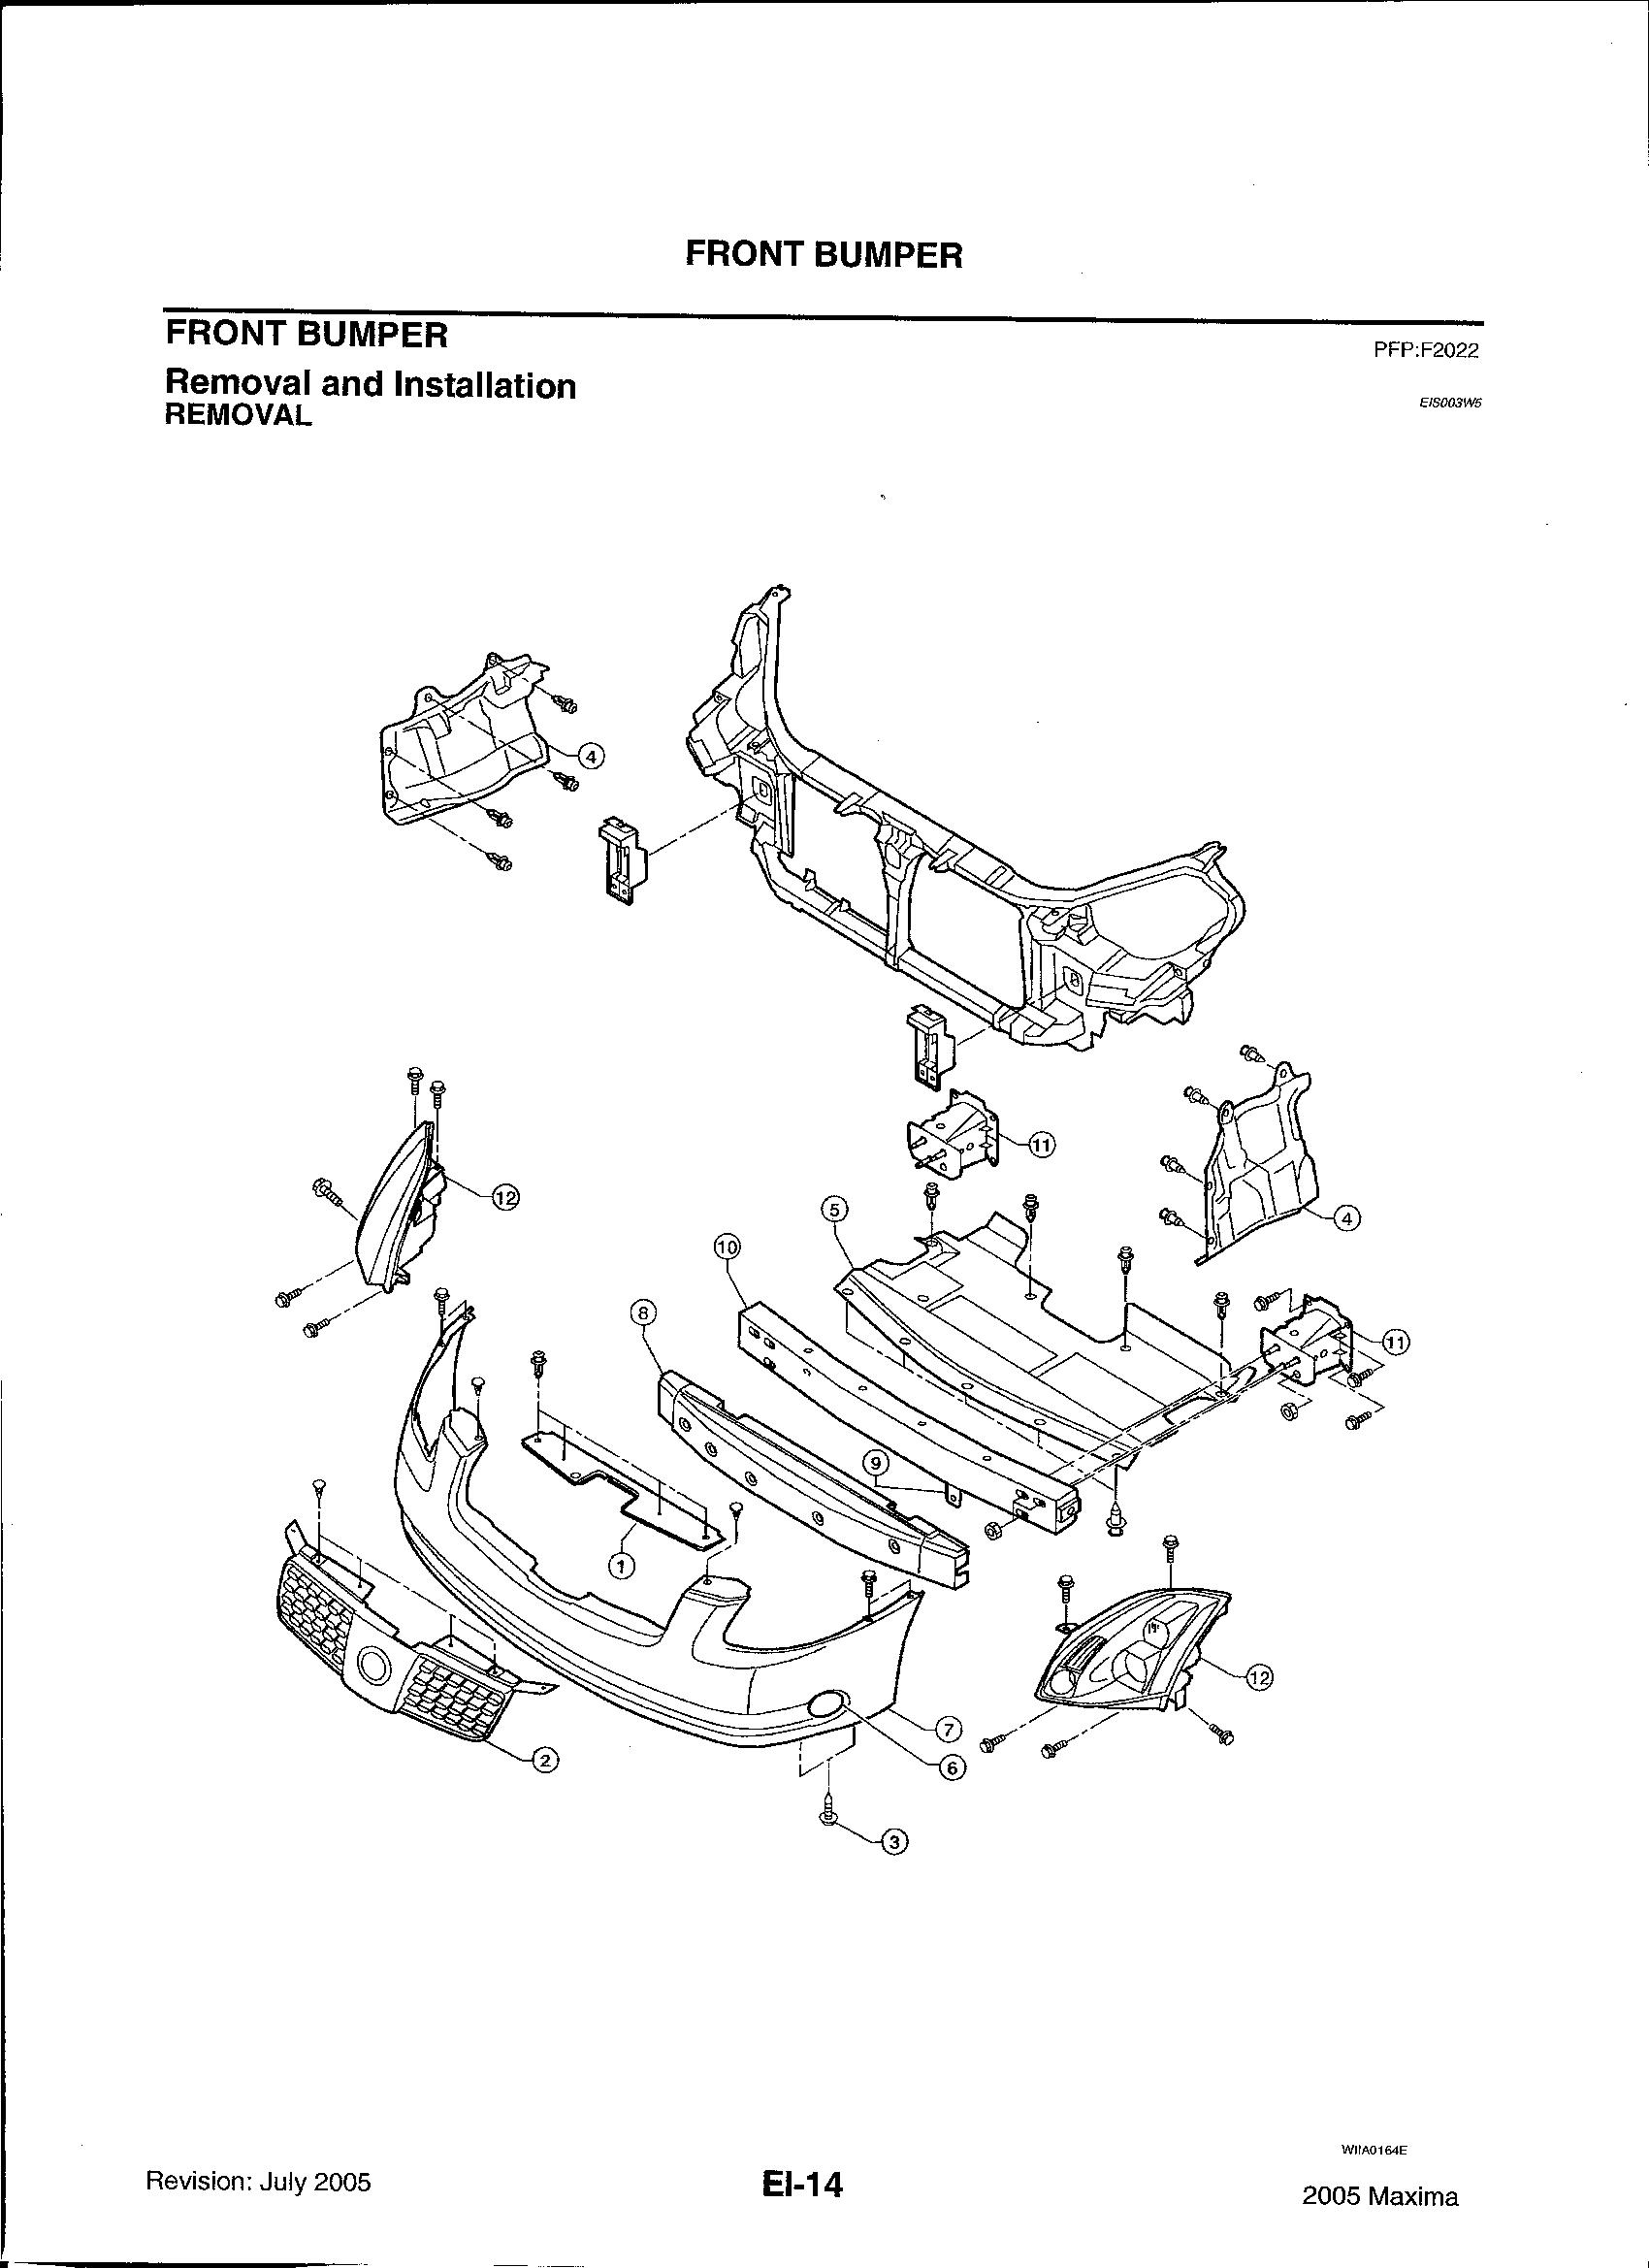 how do i change the headlight bulb on a 2005 maxima porter Indicator Light Wiring Diagram